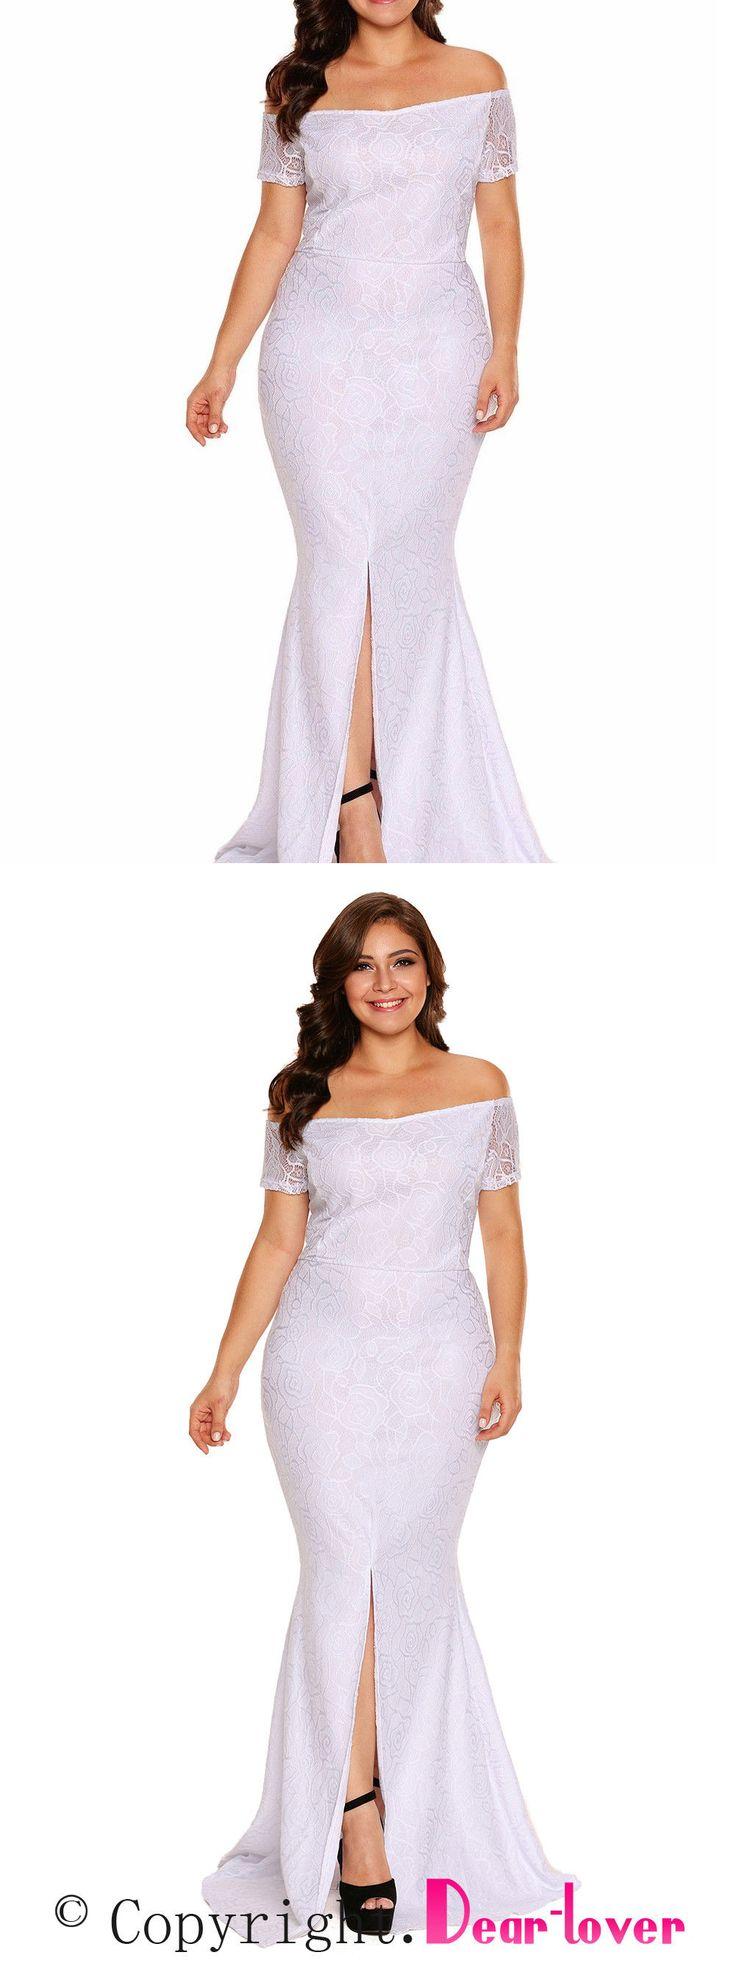 Wedding Dresses 15720: Plus Size Off Shoulder Lace Gown Wedding Gown Dress  Xxl Xxxl Halloween